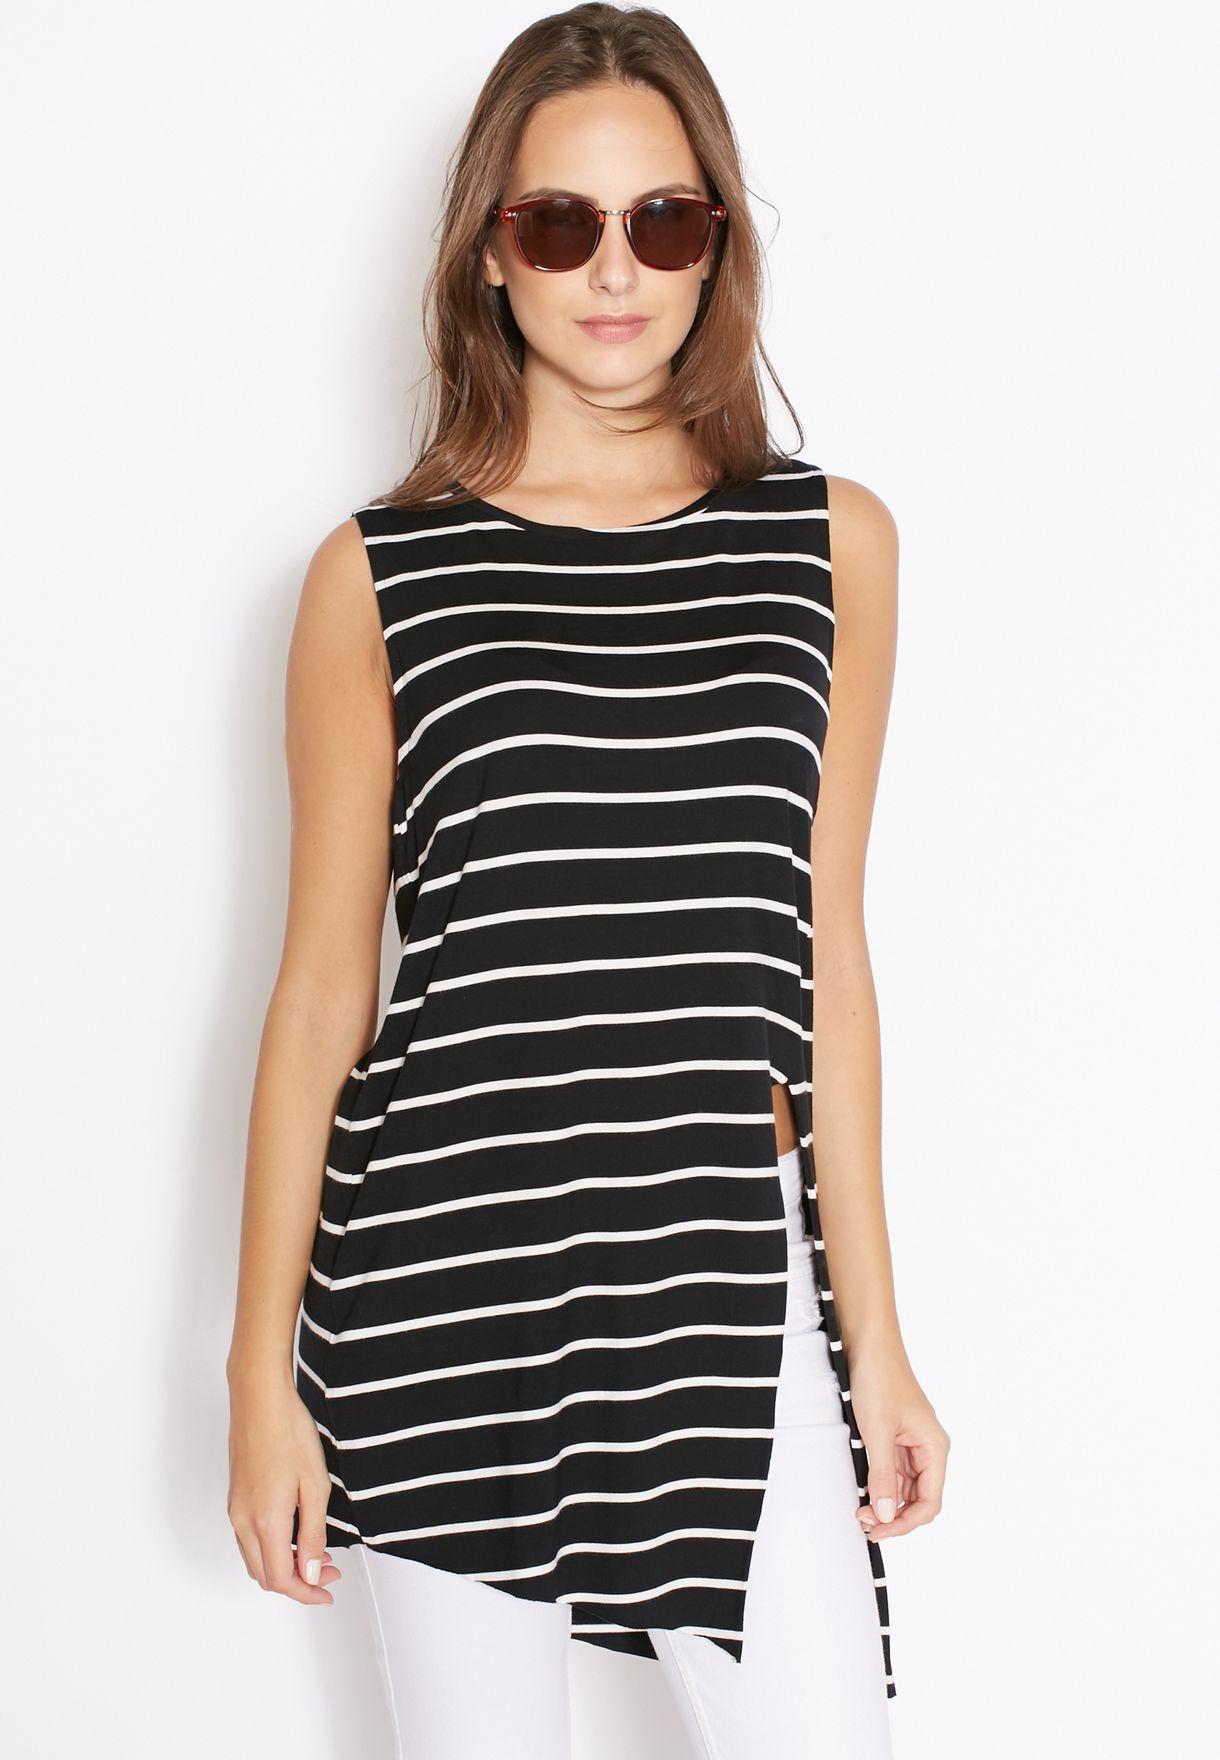 459a9ccd537 Shop Mango black Side Slit Striped Top 73020228 for Women in Qatar -  MA887AT10RFH